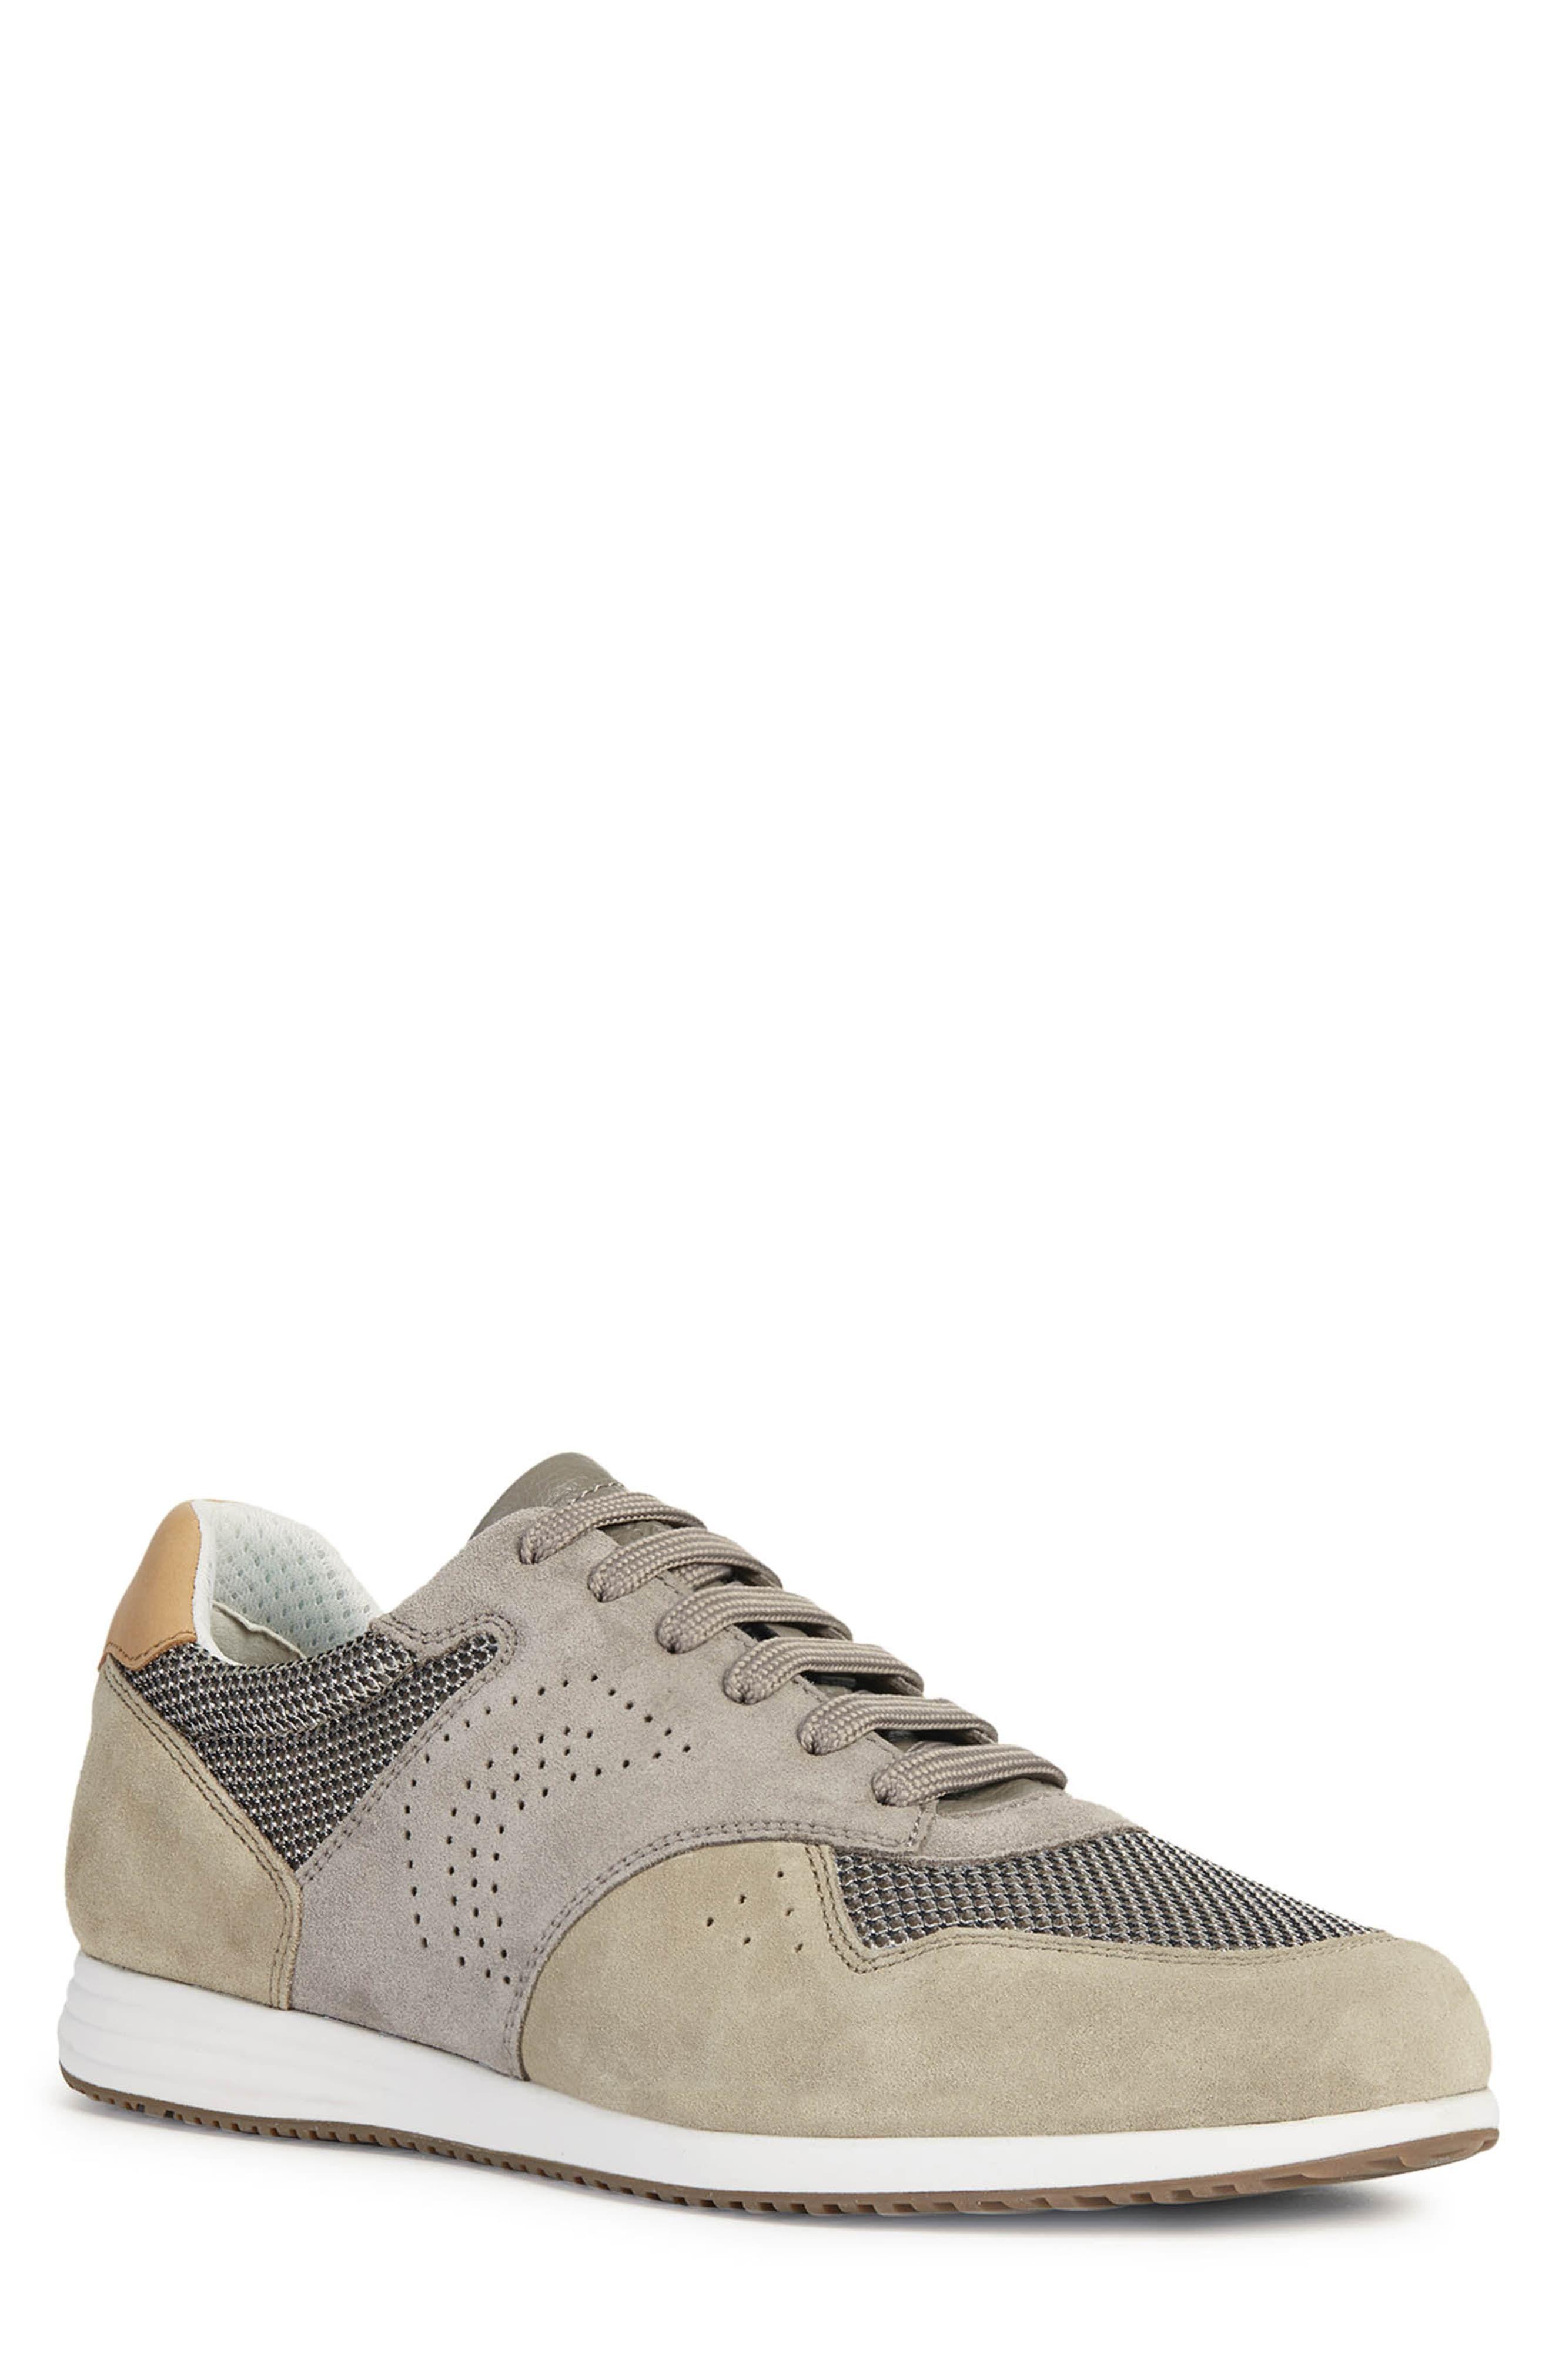 Men's Geox Arsien 1 Sneaker, Size 9US 42EU Grey in 2019